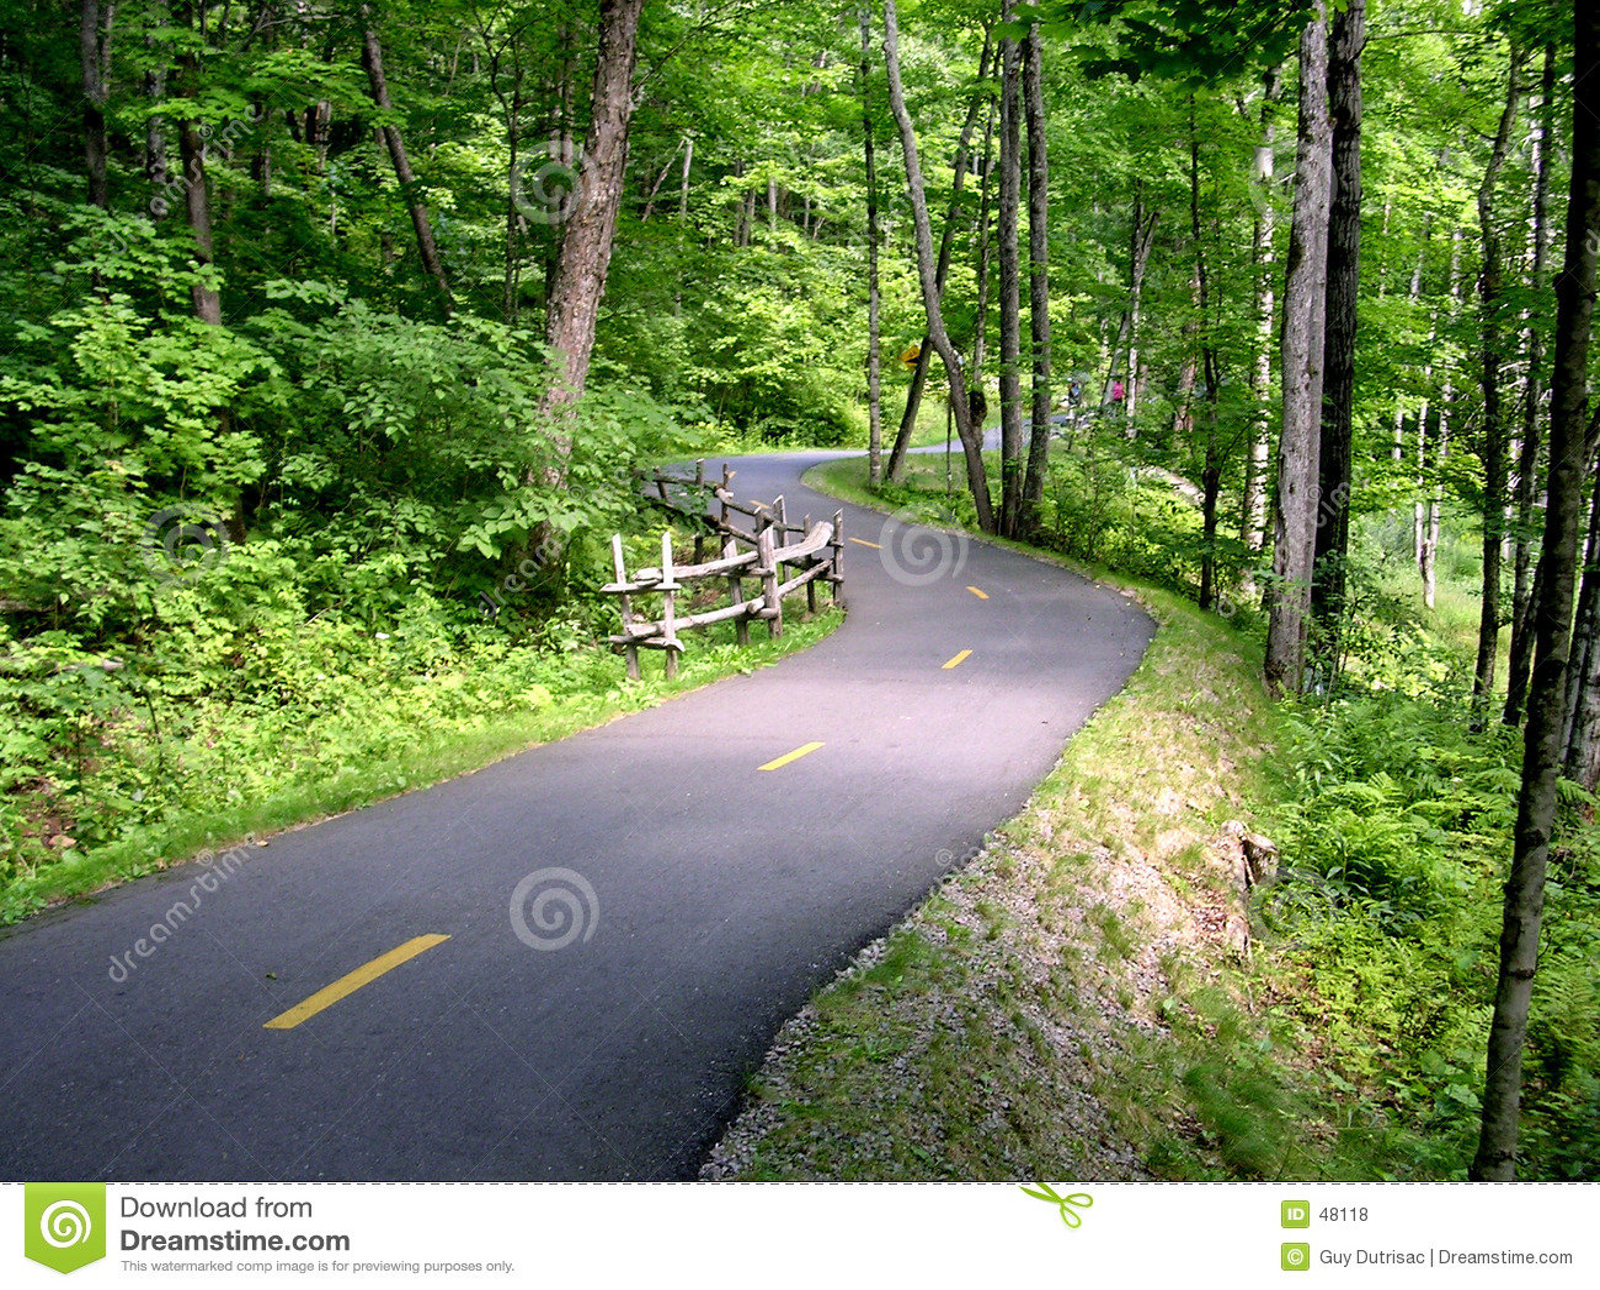 Download μονοπάτι ποδηλάτων στοκ εικόνες. εικόνα από δέντρα, κοσμημάτων - 48118